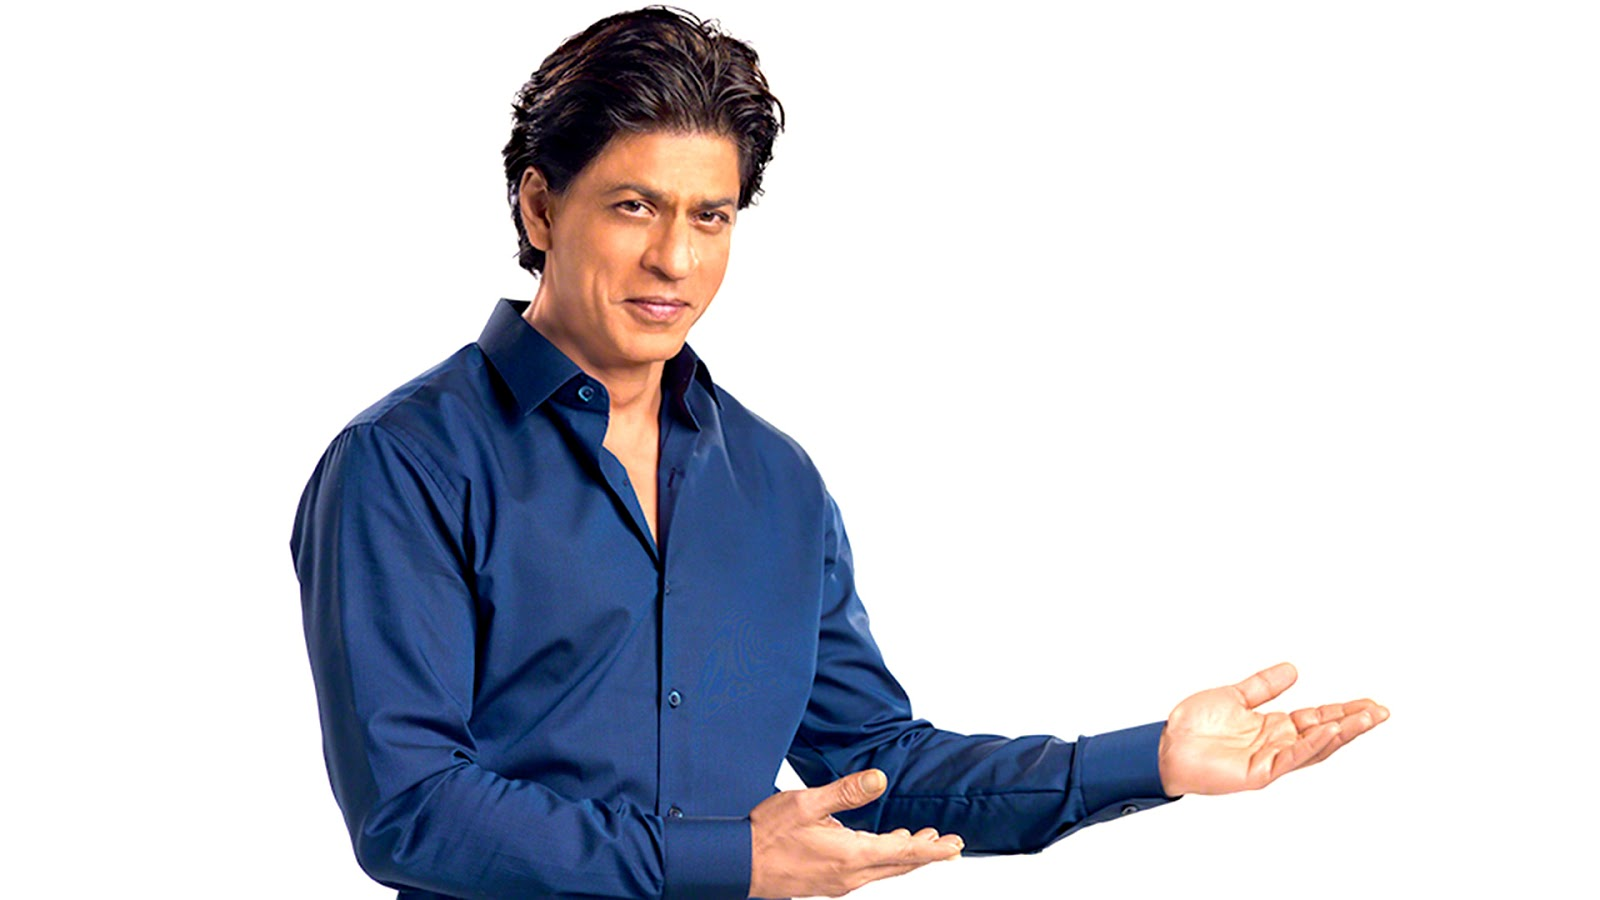 Shahrukh Khan Wallpapers: Shahrukh Khan Wallpapers HD Download Free 1080p